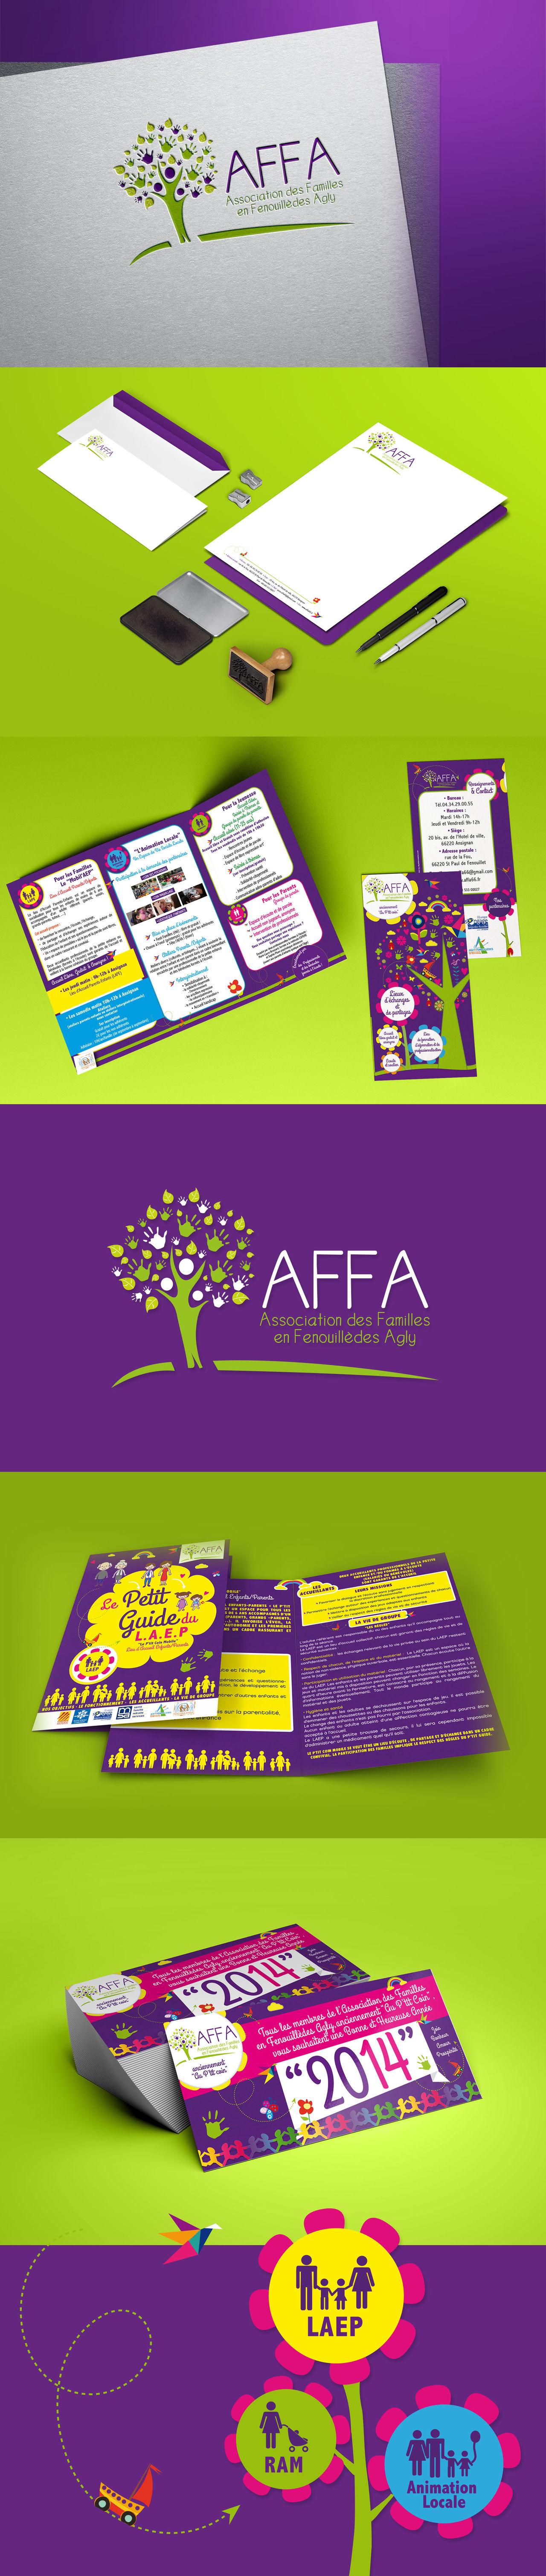 Association AFFA 66